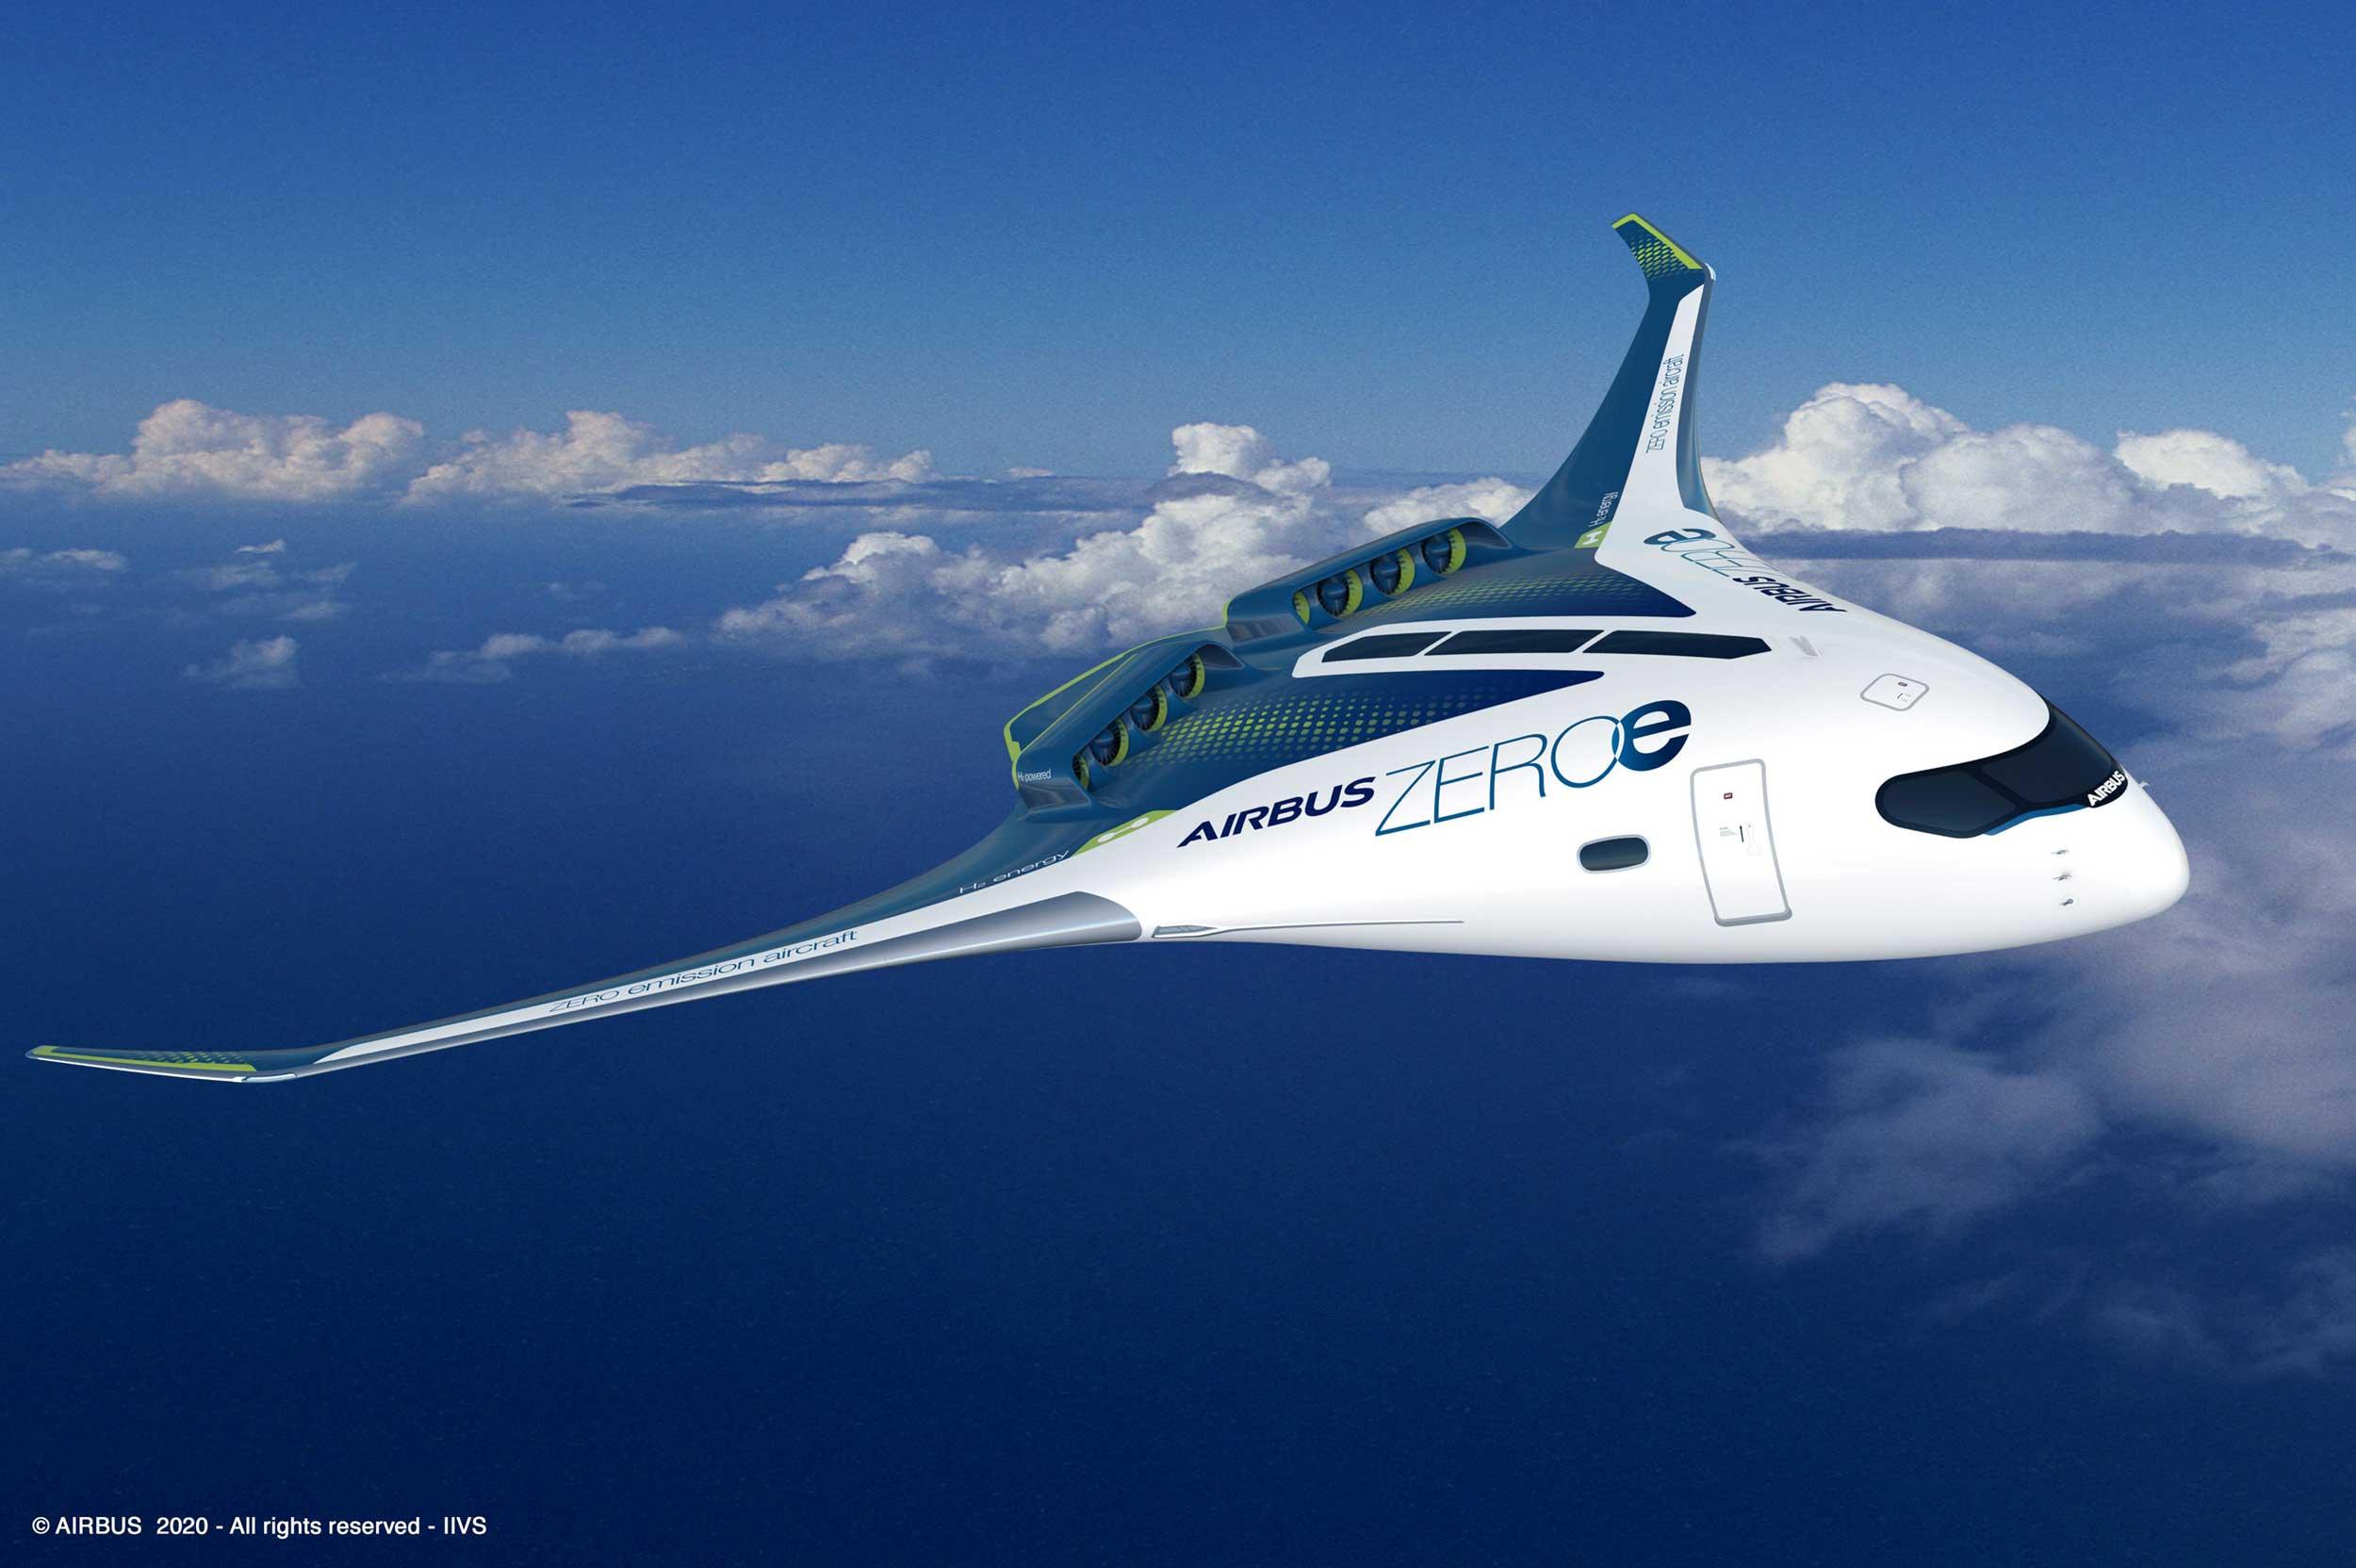 Airbus ZEROe blended wing